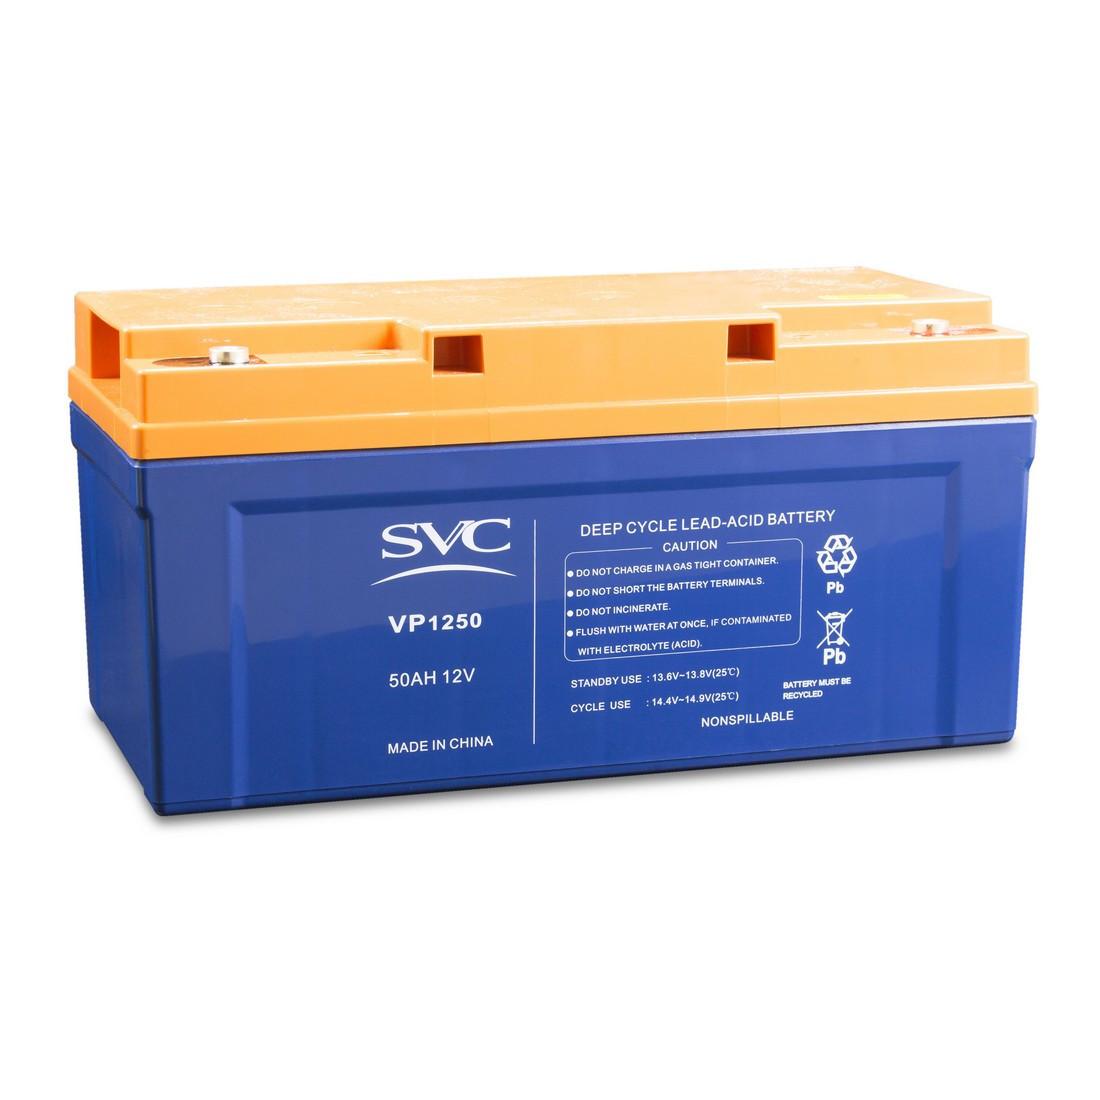 Батарея необслуживаемая (аккумулятор) SVC VP 1250 (12V 50 Ah), Емкость аккумулятора: 50 Ah, Разъемы: F5/F12